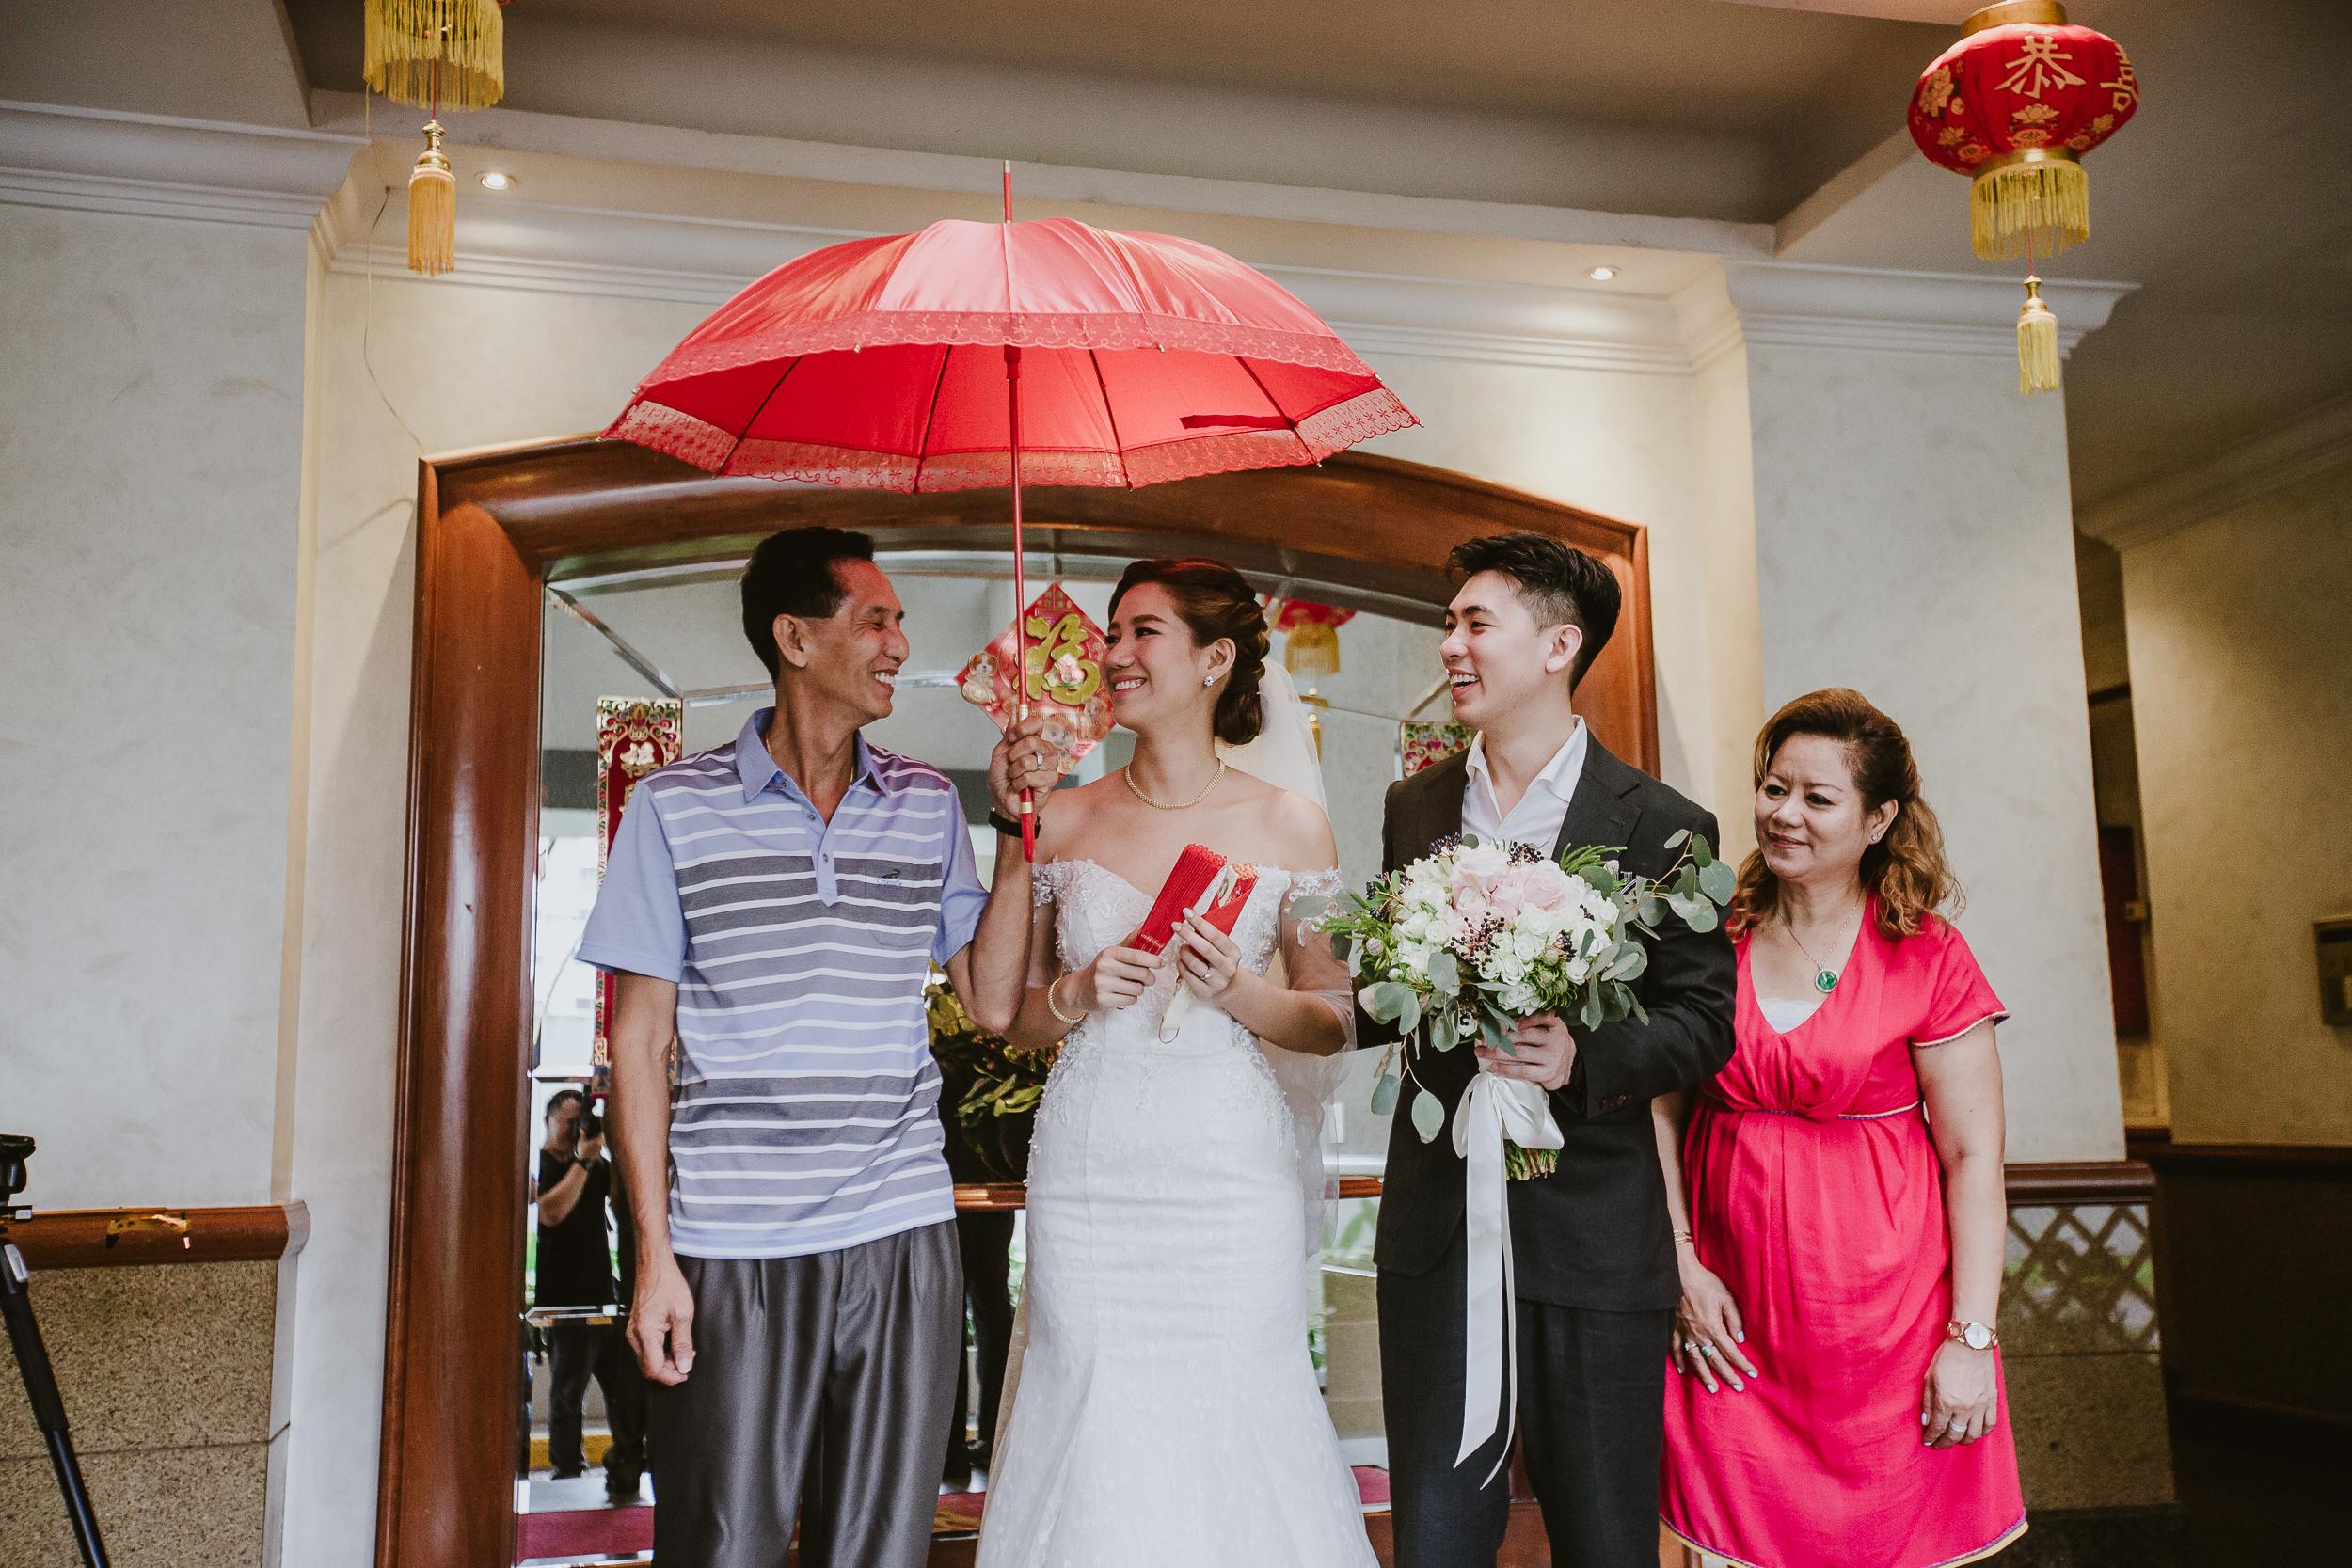 Singapore+Actual+Day+Wedding+Photographer+Raffles+Town+Club+Jeremiah+Christina-0037.jpg